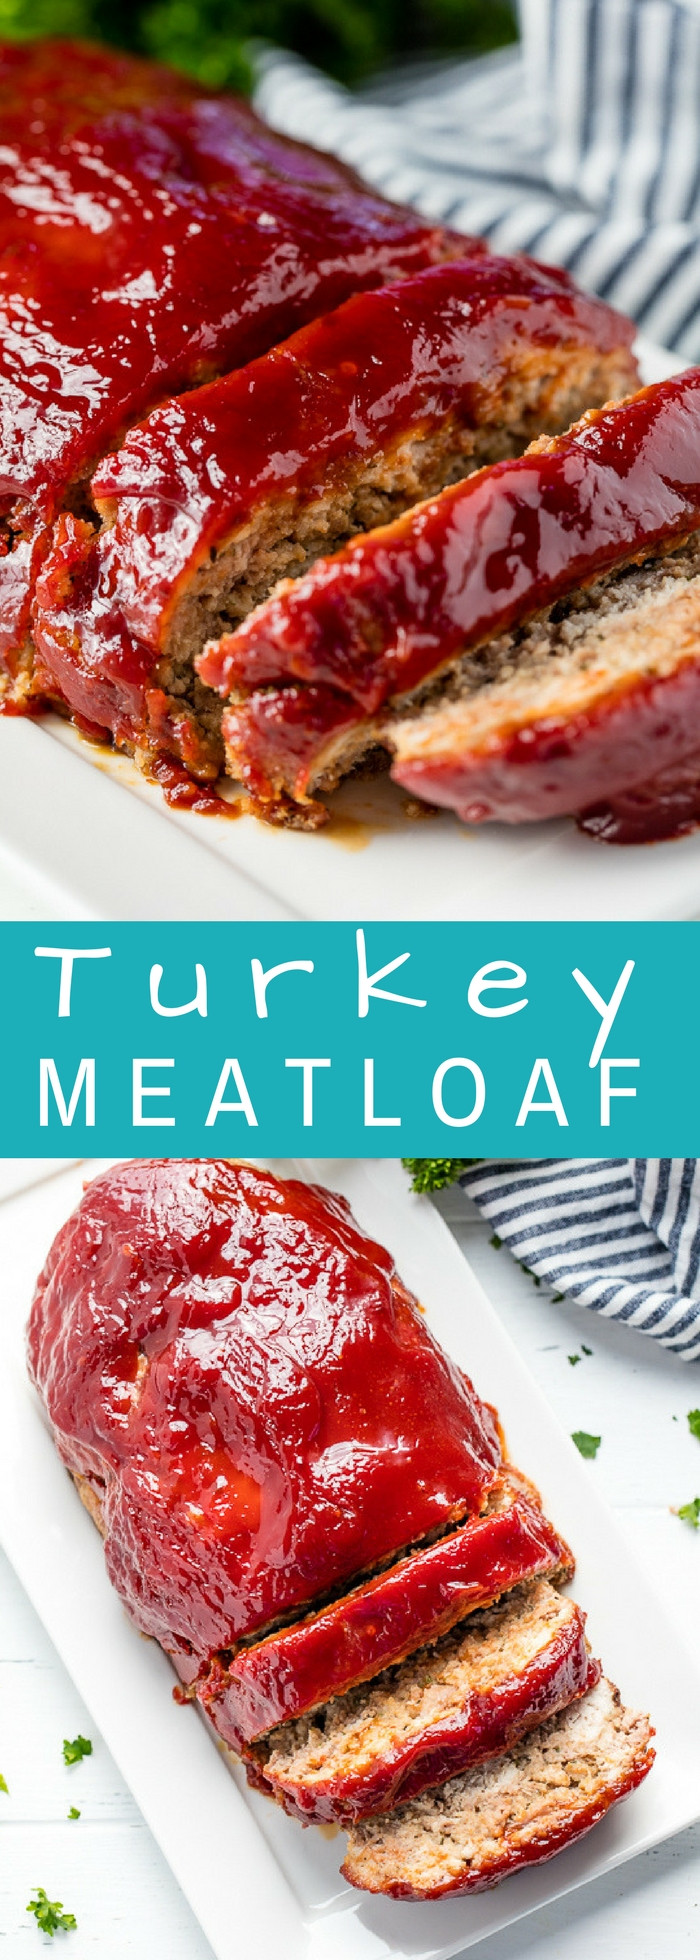 Heart Healthy Meatloaf  Turkey Meatloaf